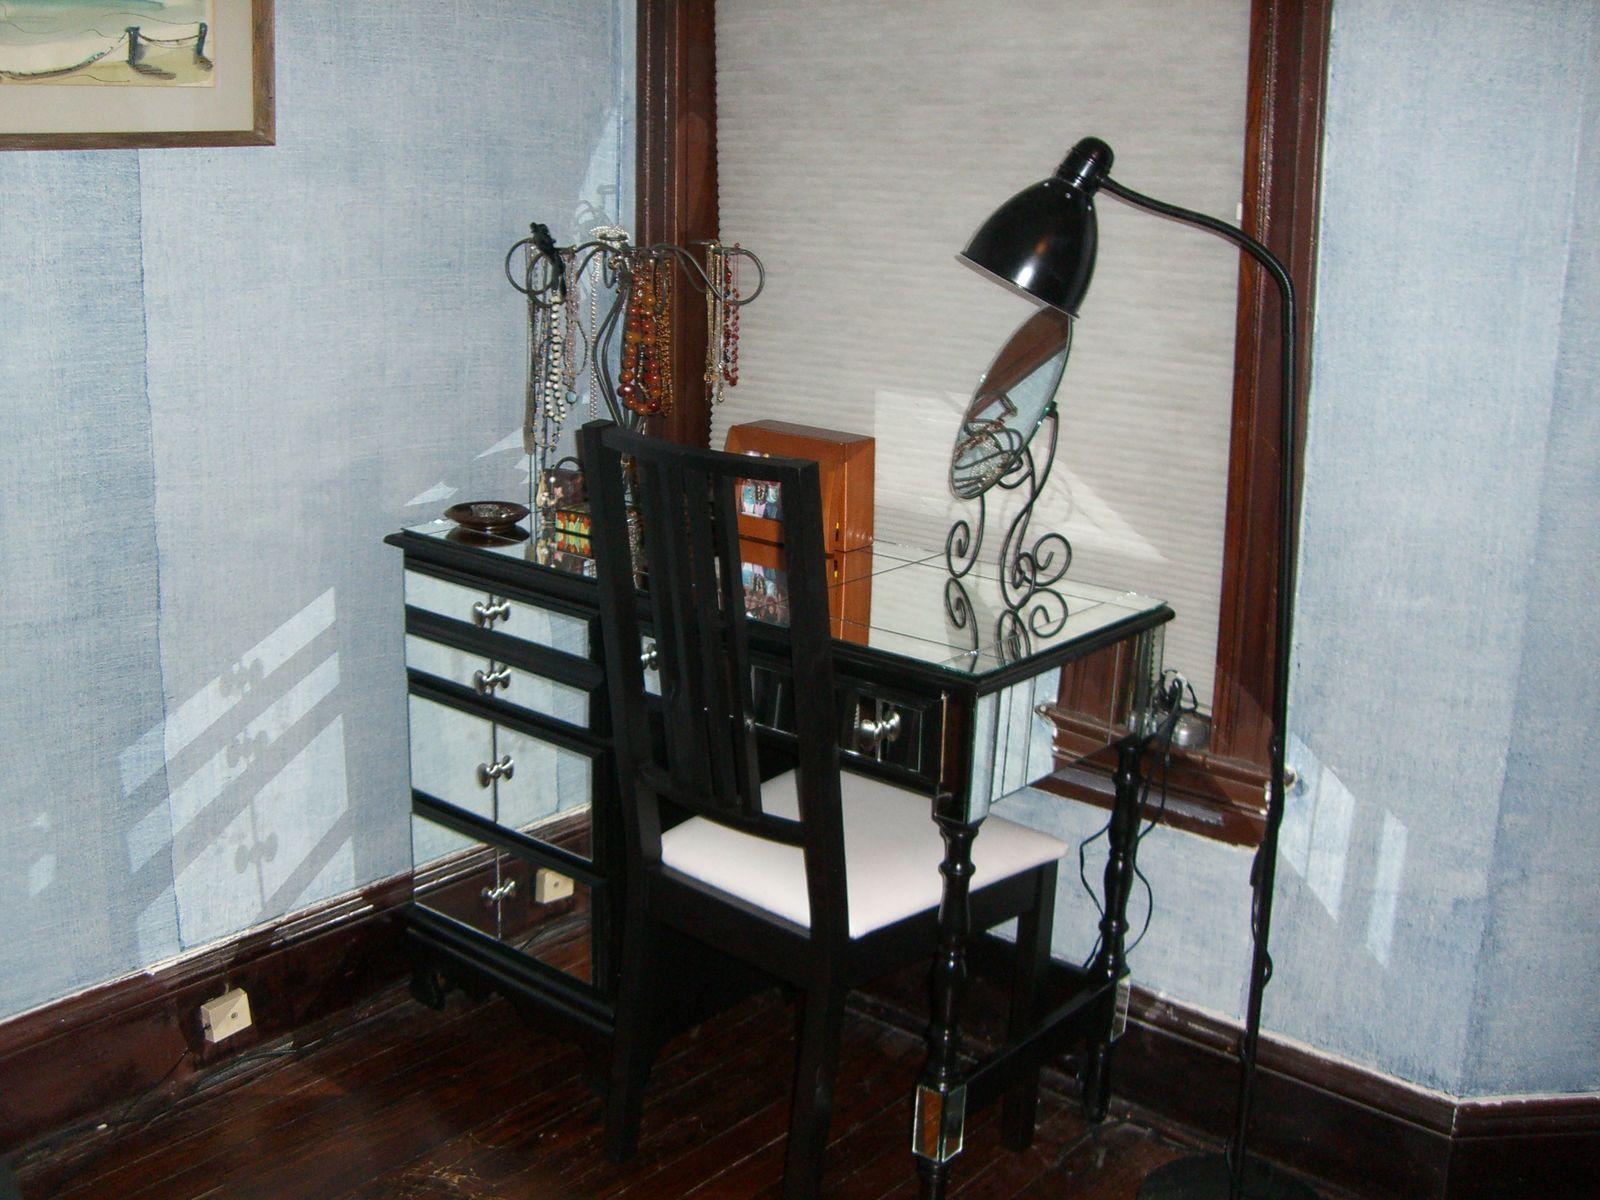 Mirrored vanity desk Mirrored vanity desk, Vanity desk